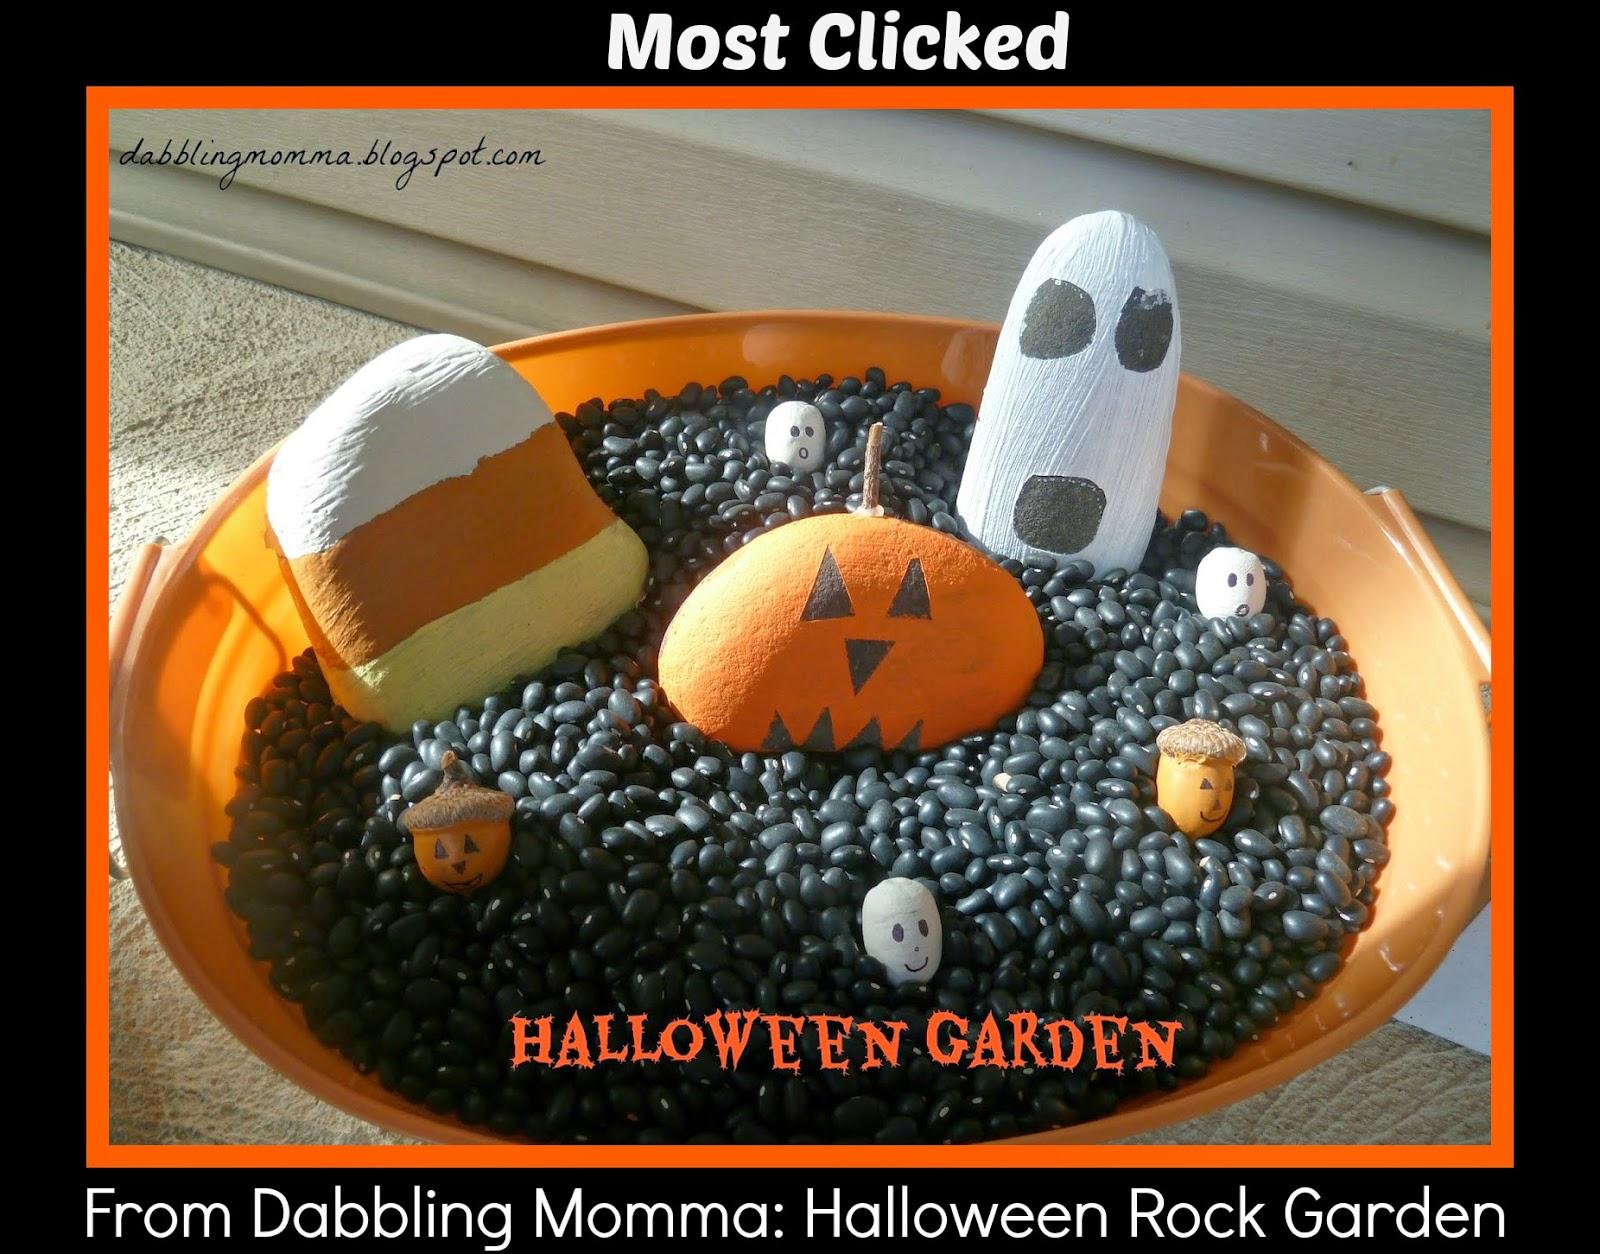 http://dabblingmomma.blogspot.com/2014/10/halloween-rock-garden.html